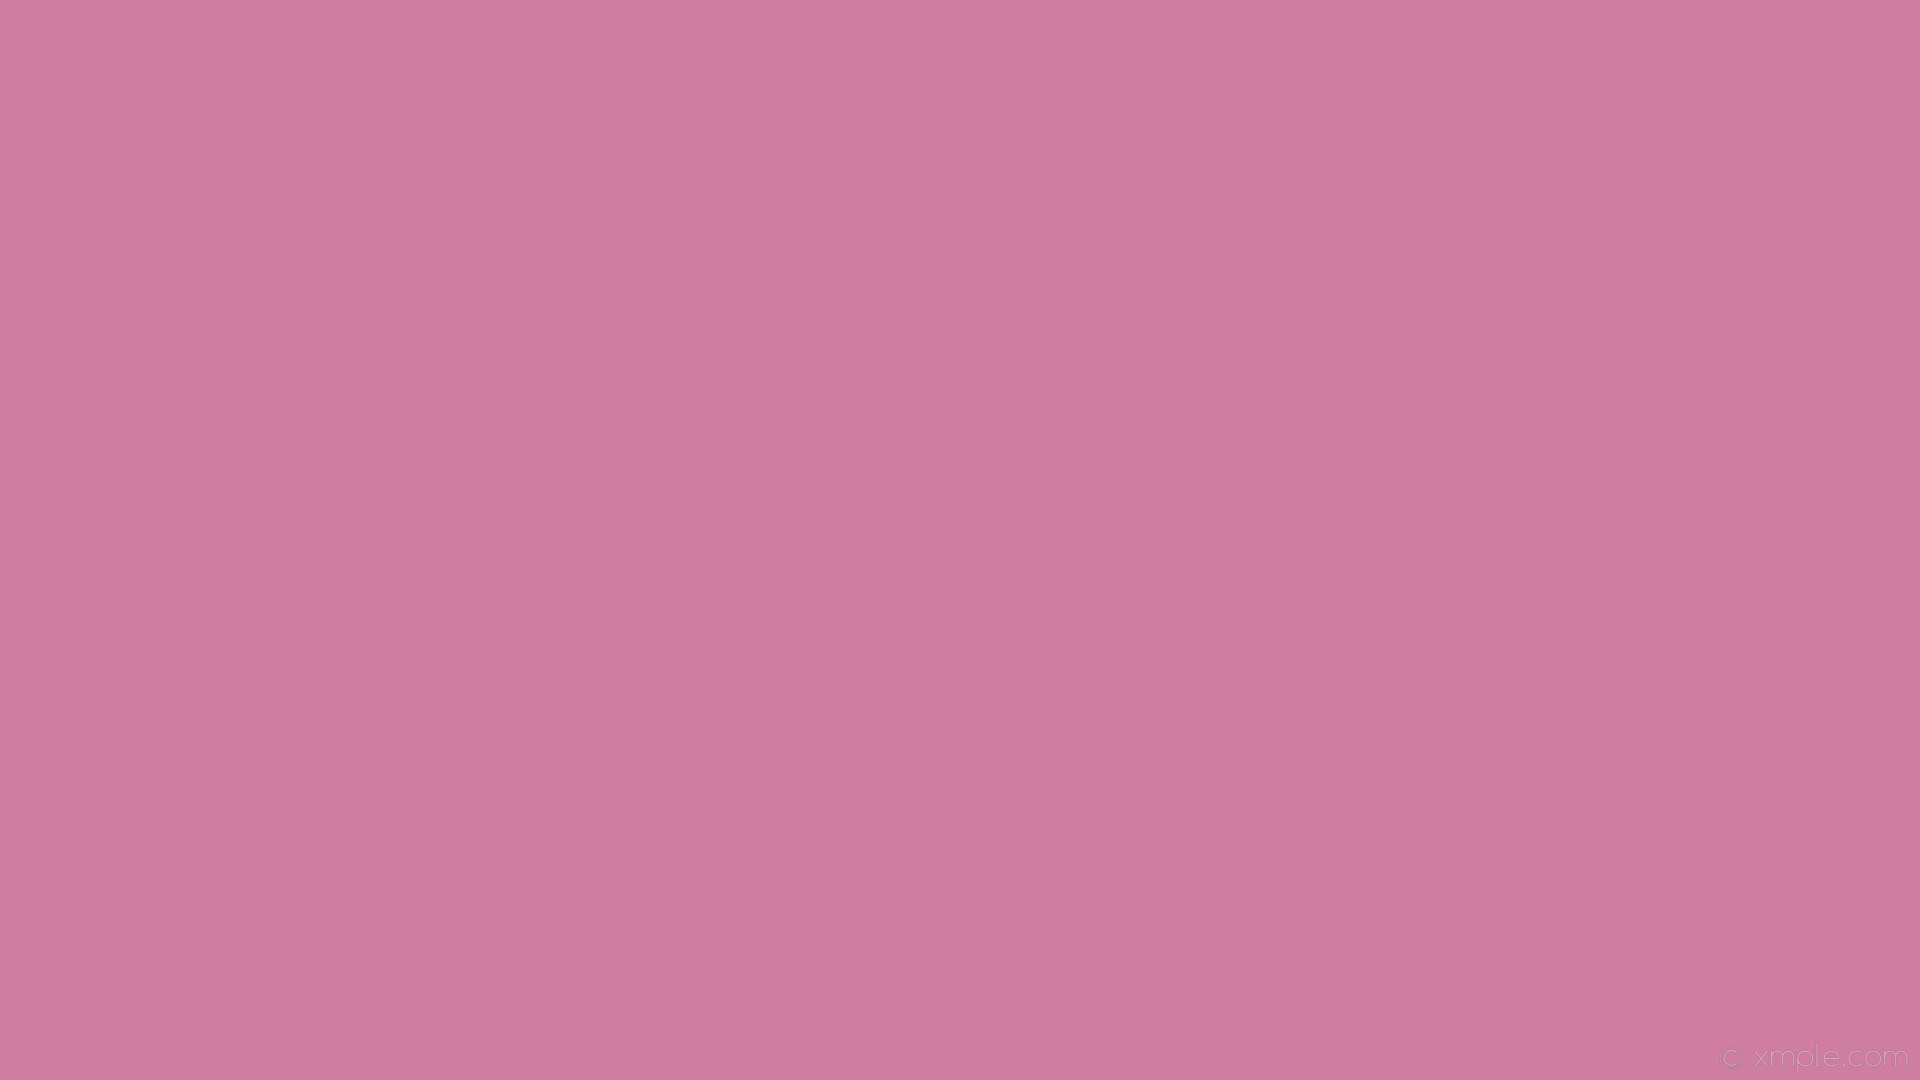 wallpaper pink solid color plain one colour single #cf7da0